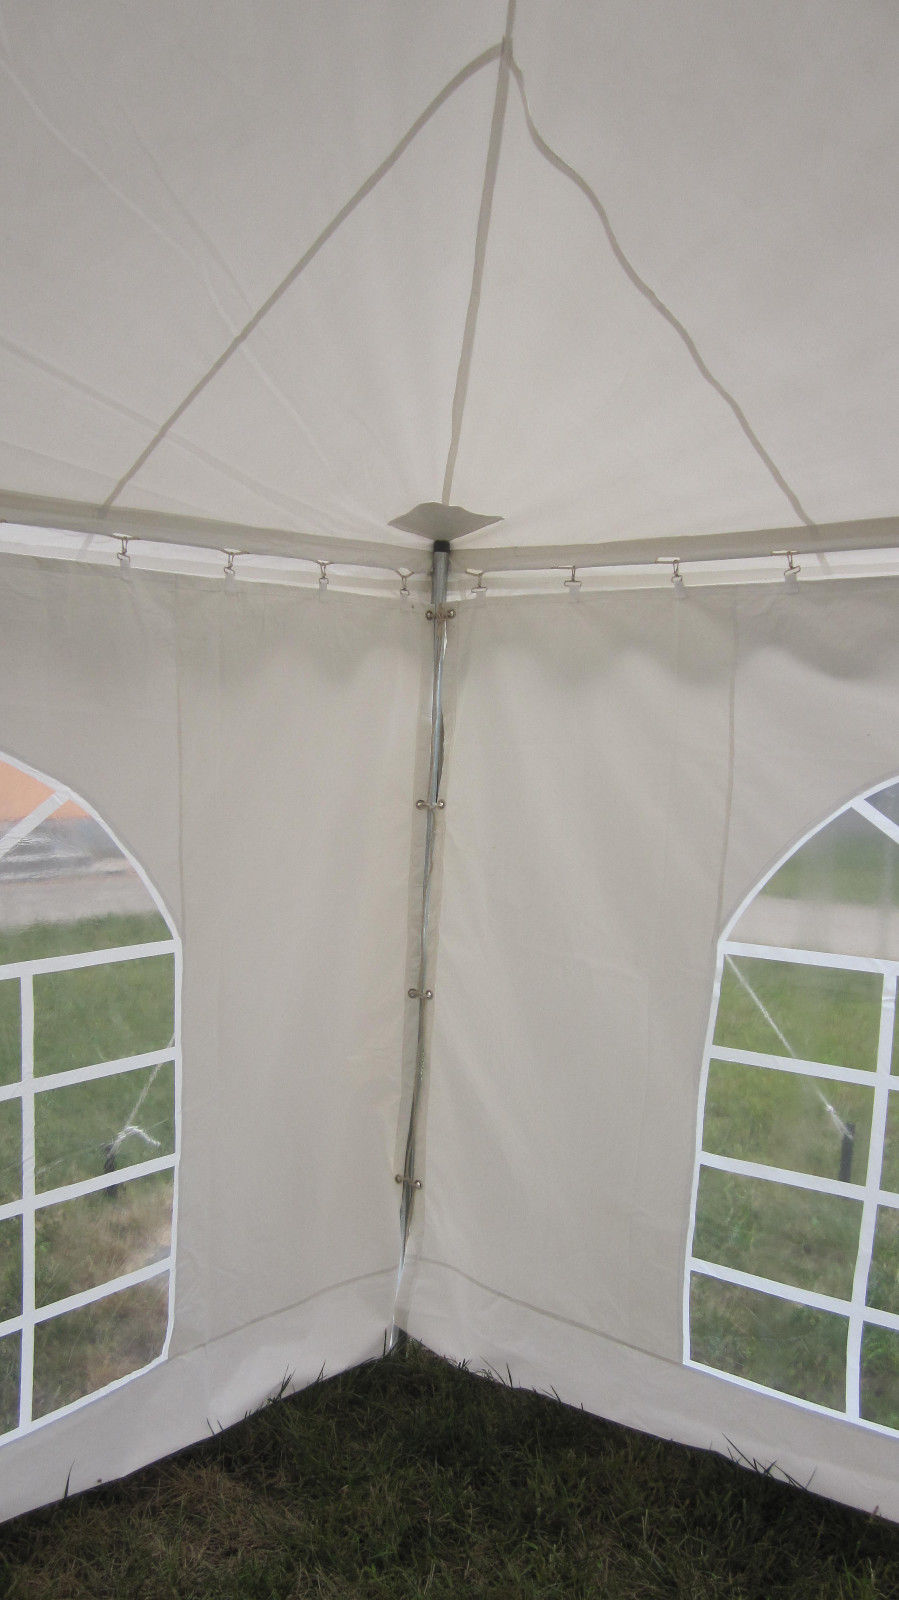 20 x 40 PVC Pole Tent Canopy 3 & 20 x 40 PVC Pole Tent Canopy Gazebo -